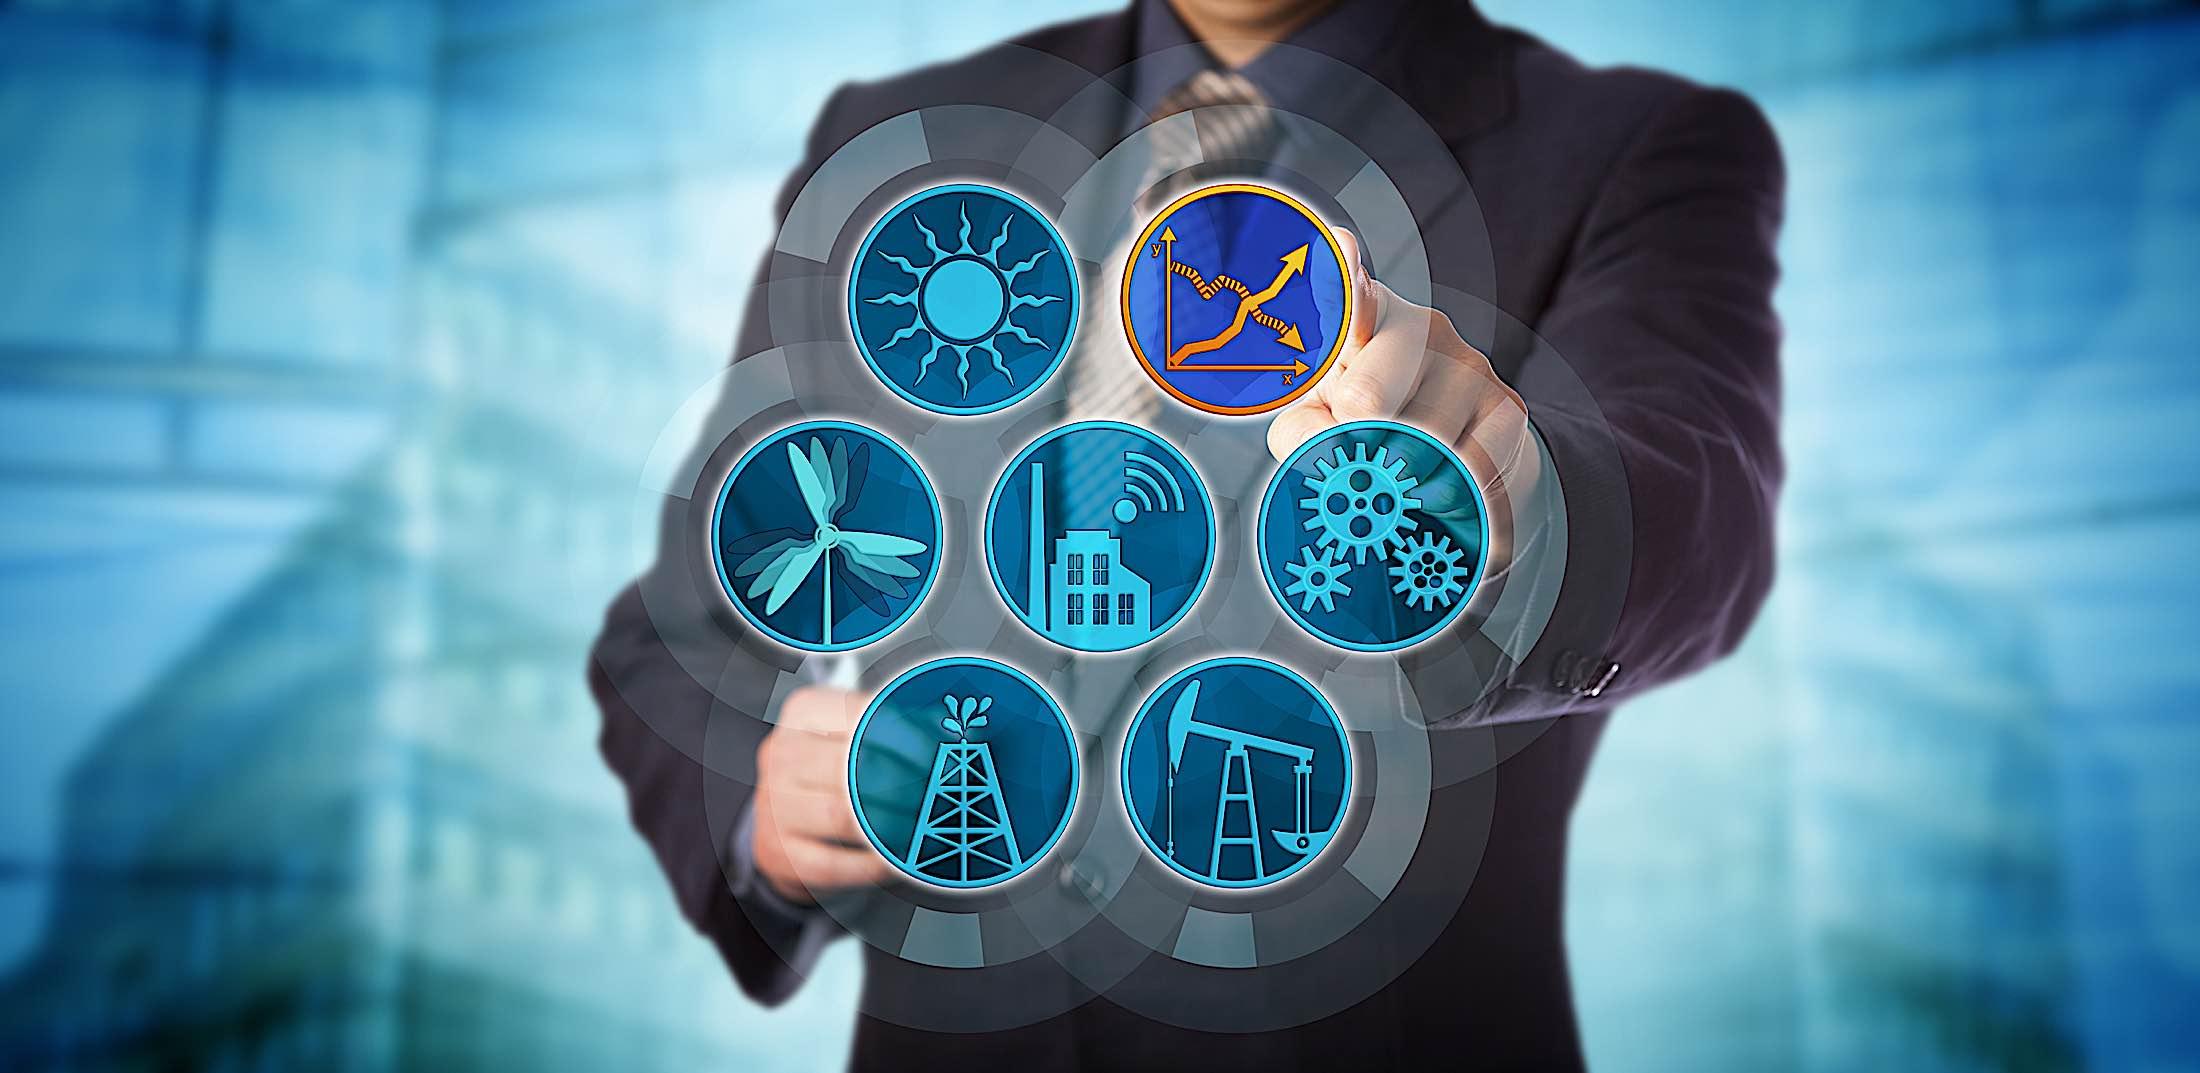 Engineered Design Insider Manufacturing efficiencyOil Gas Automotive Aerospace Industry Magazine